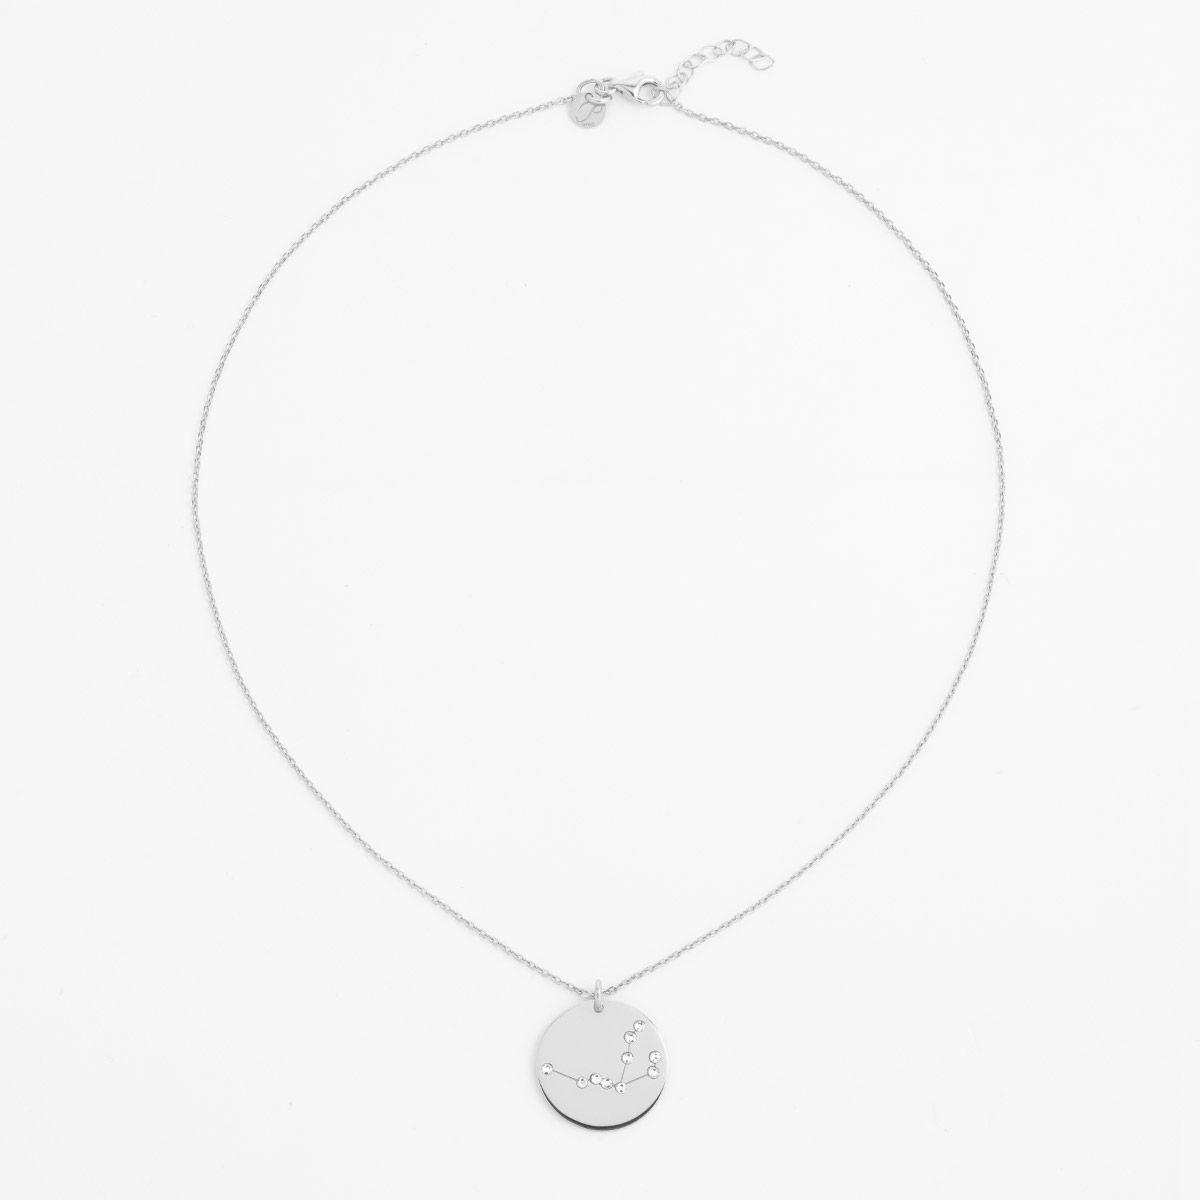 Reese - Halsketten - Silber